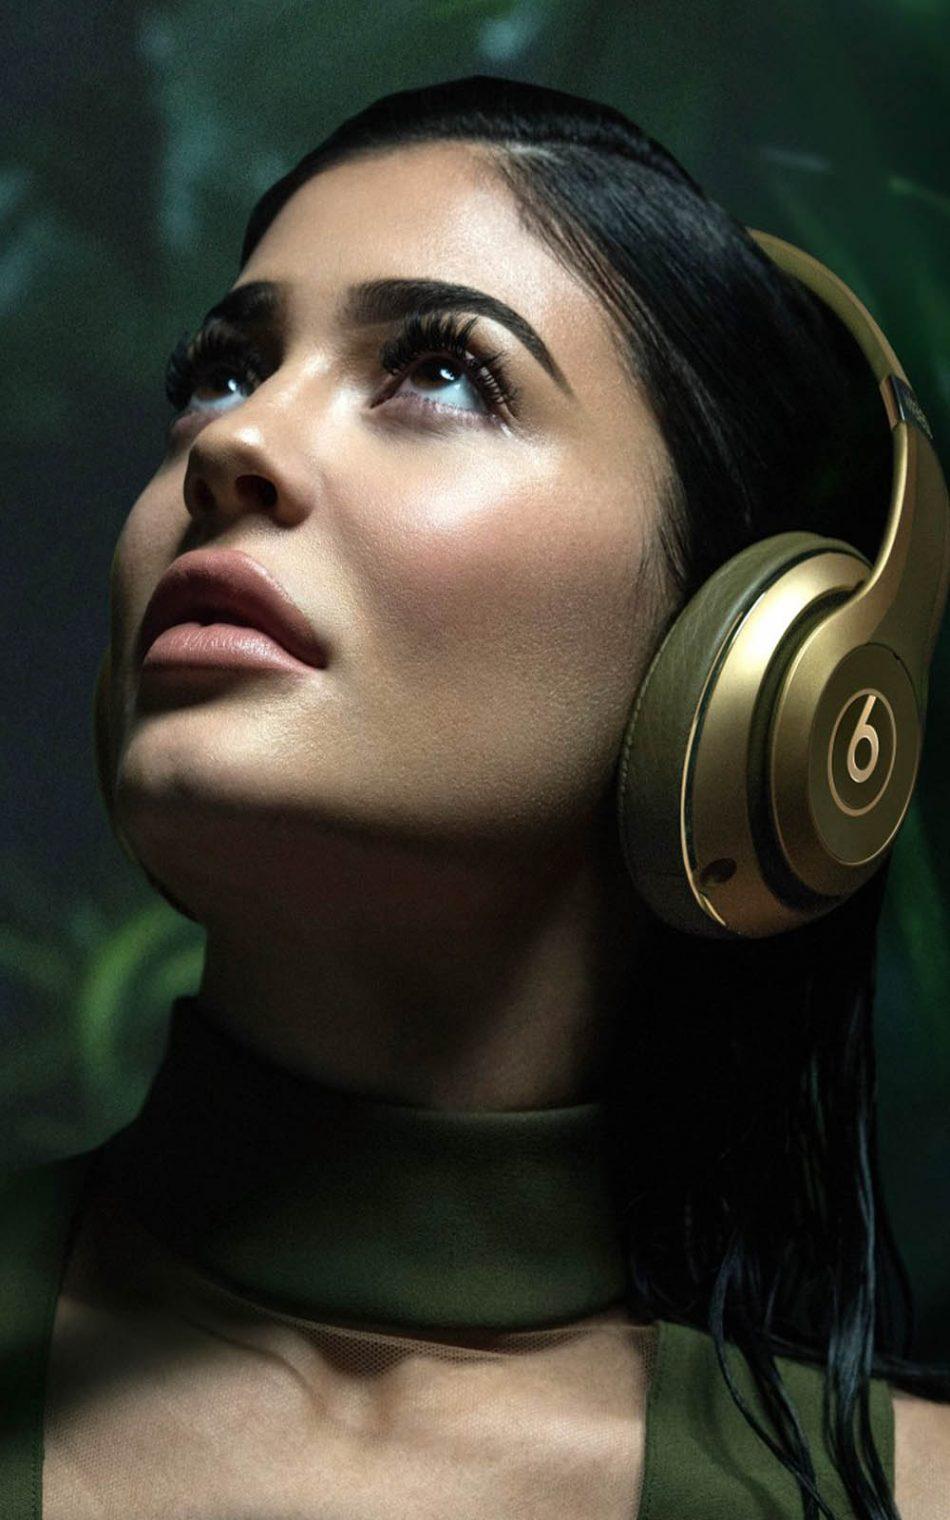 Kylie Jenner Using Beats HD Mobile Wallpaper